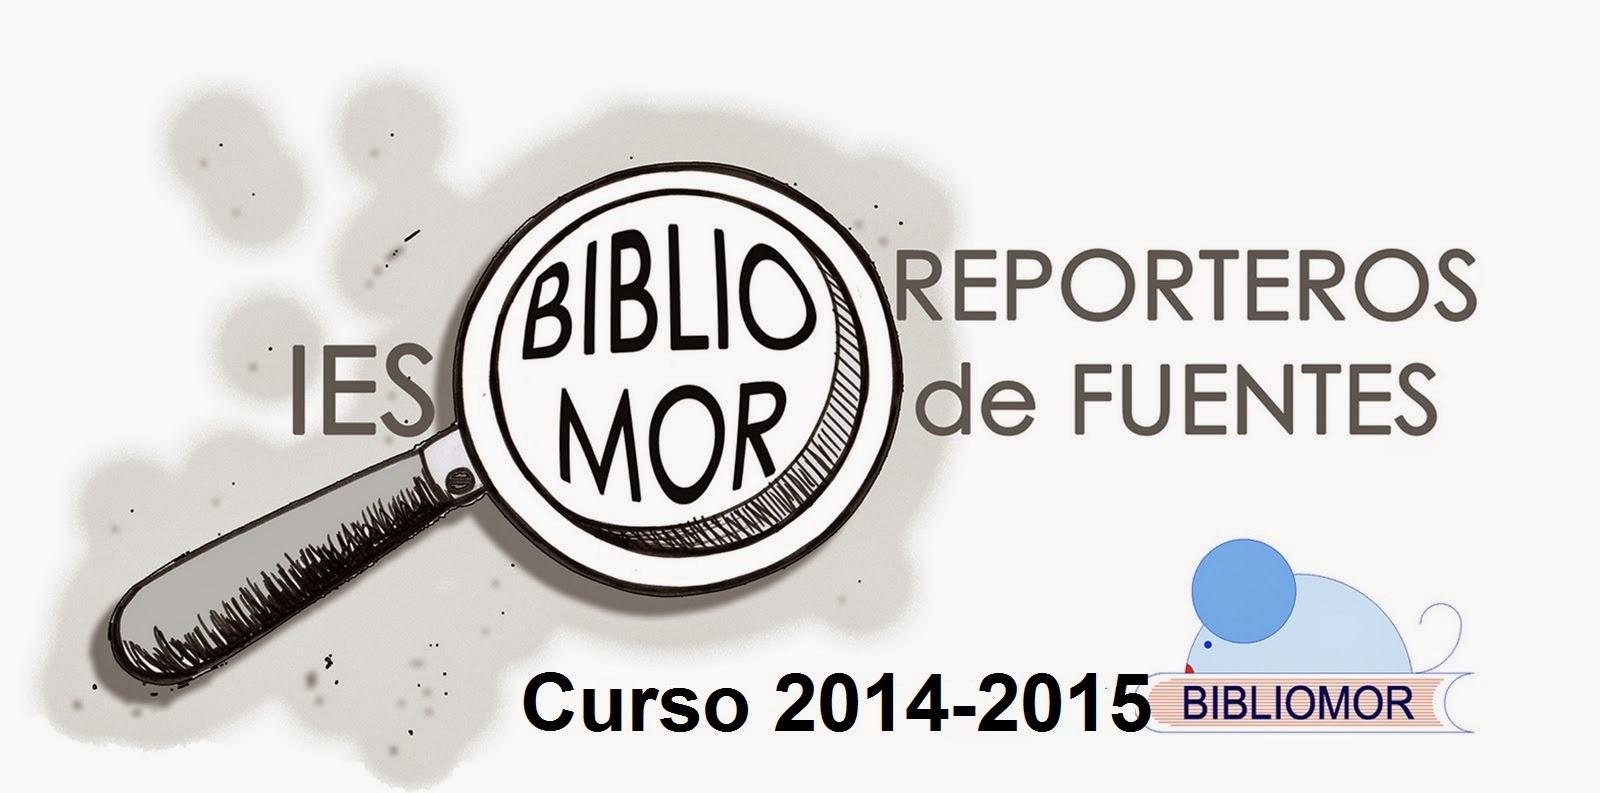 BIBLIORREPORTEROS